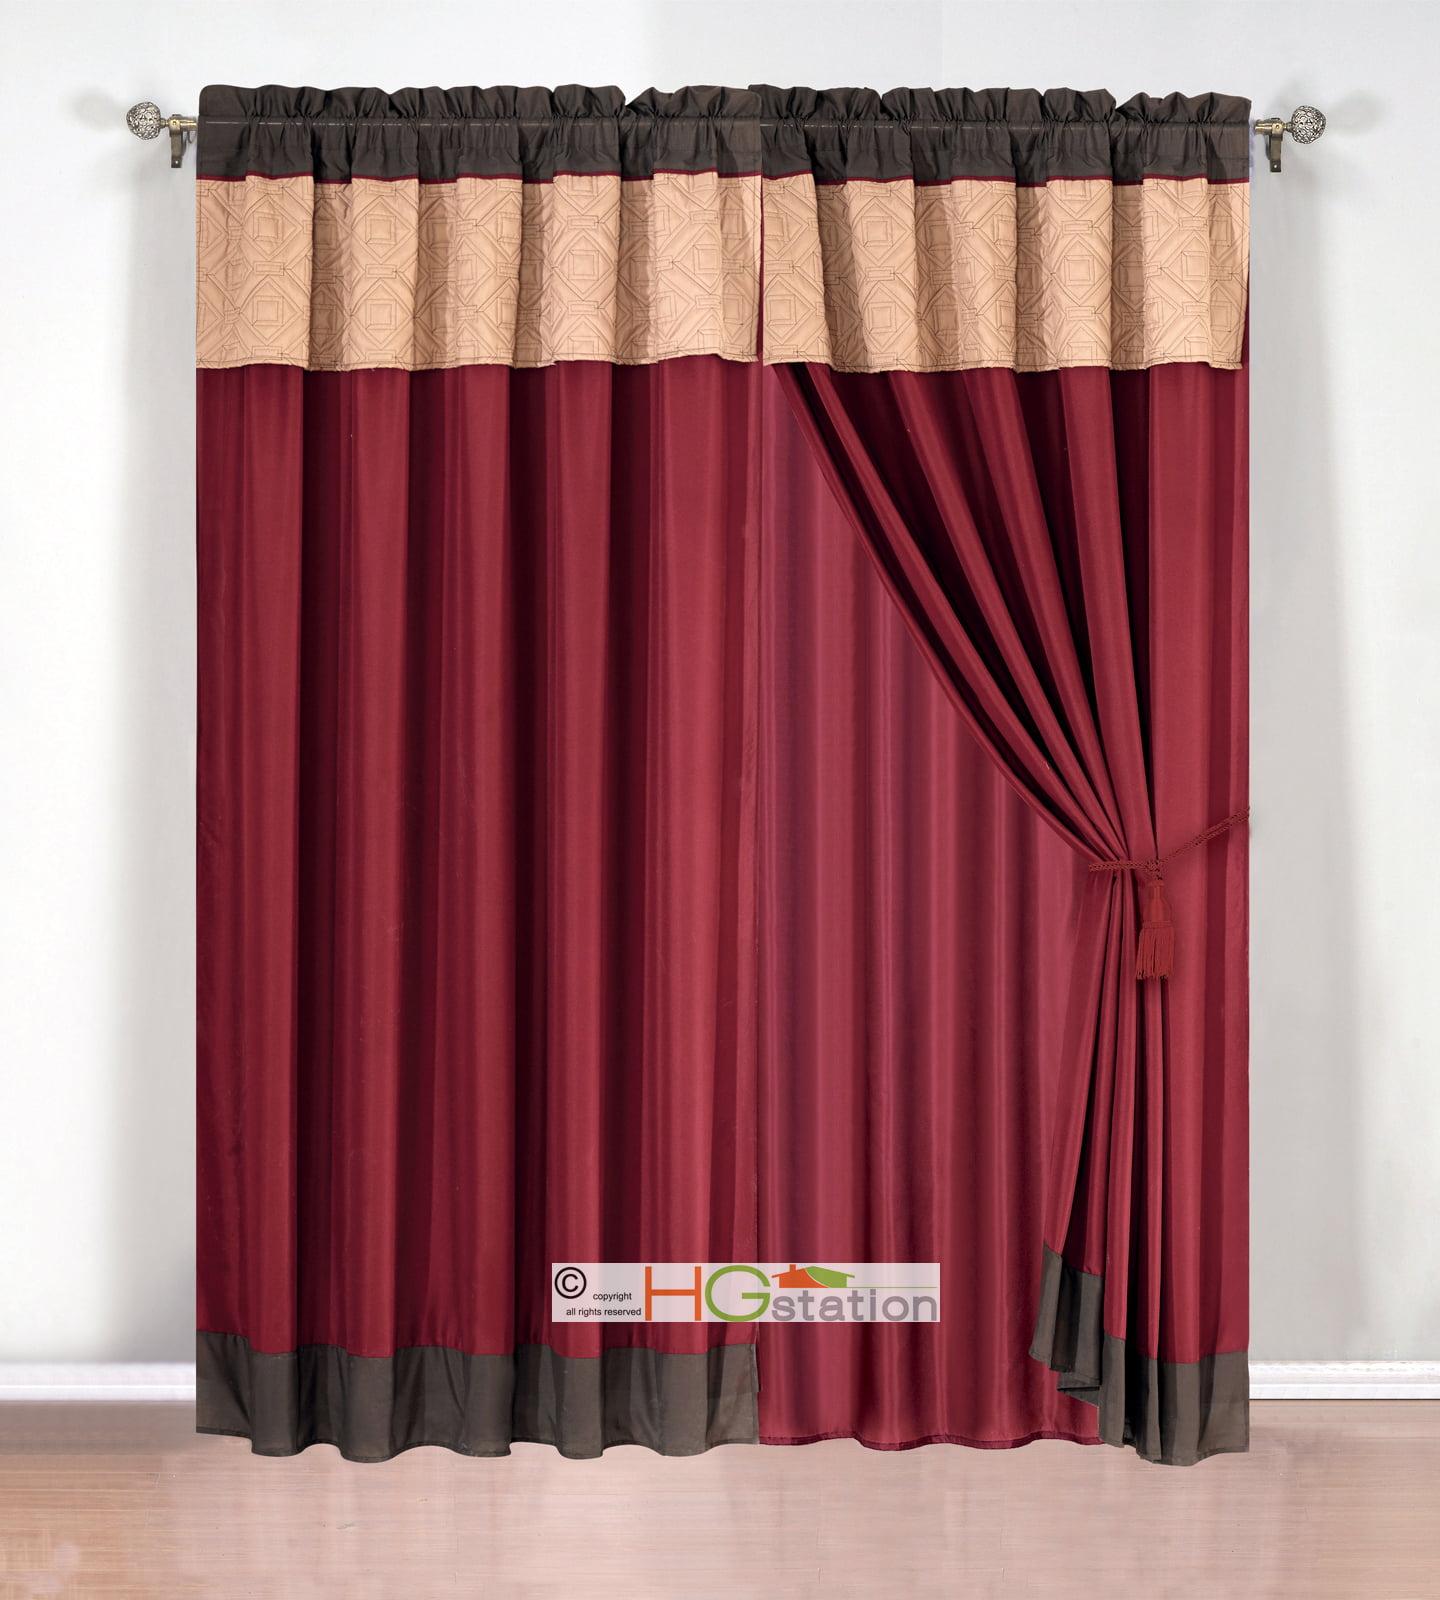 4-Pc Quilted Tile Diamond Square Curtain Set Valance Drape